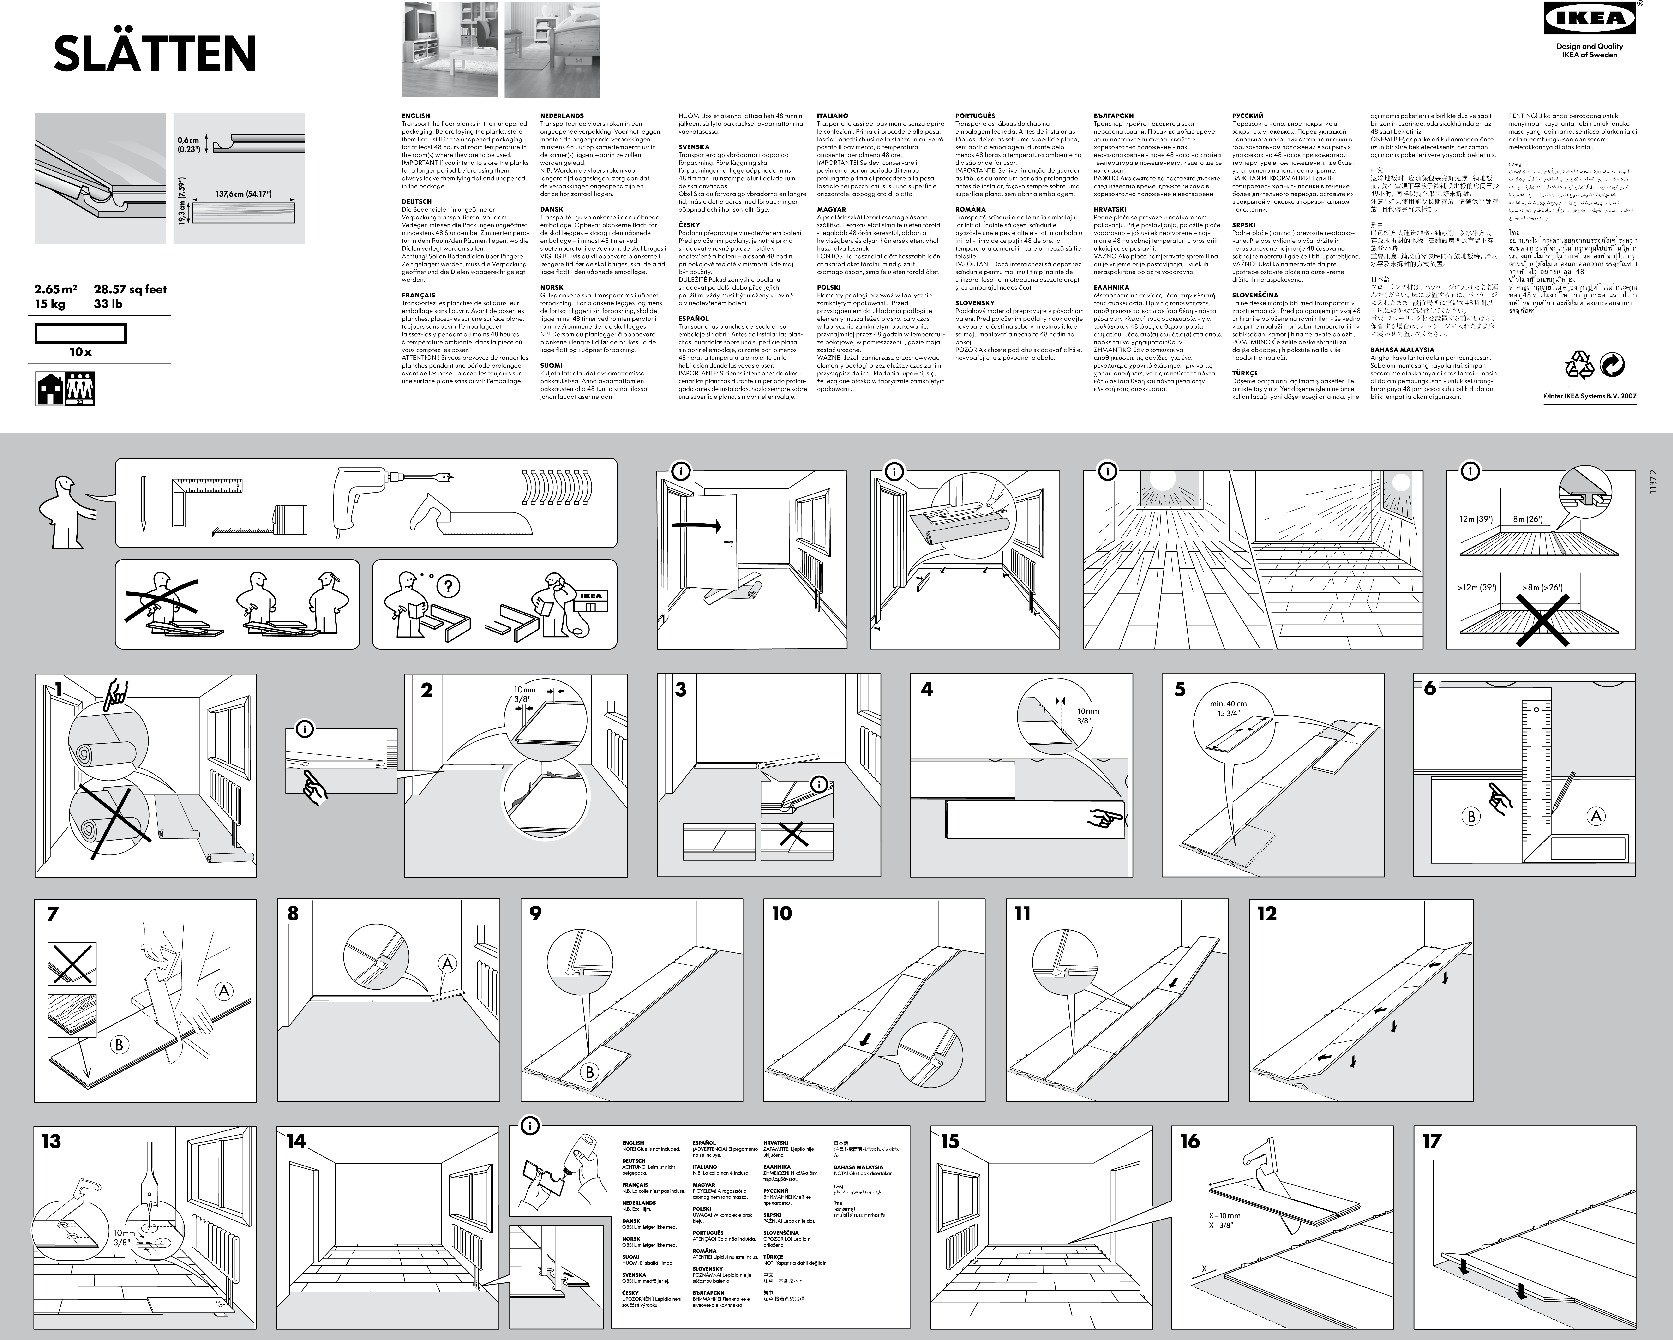 SLÄTTEN Sol stratifié motif chêne (IKEA France) - IKEAPEDIA